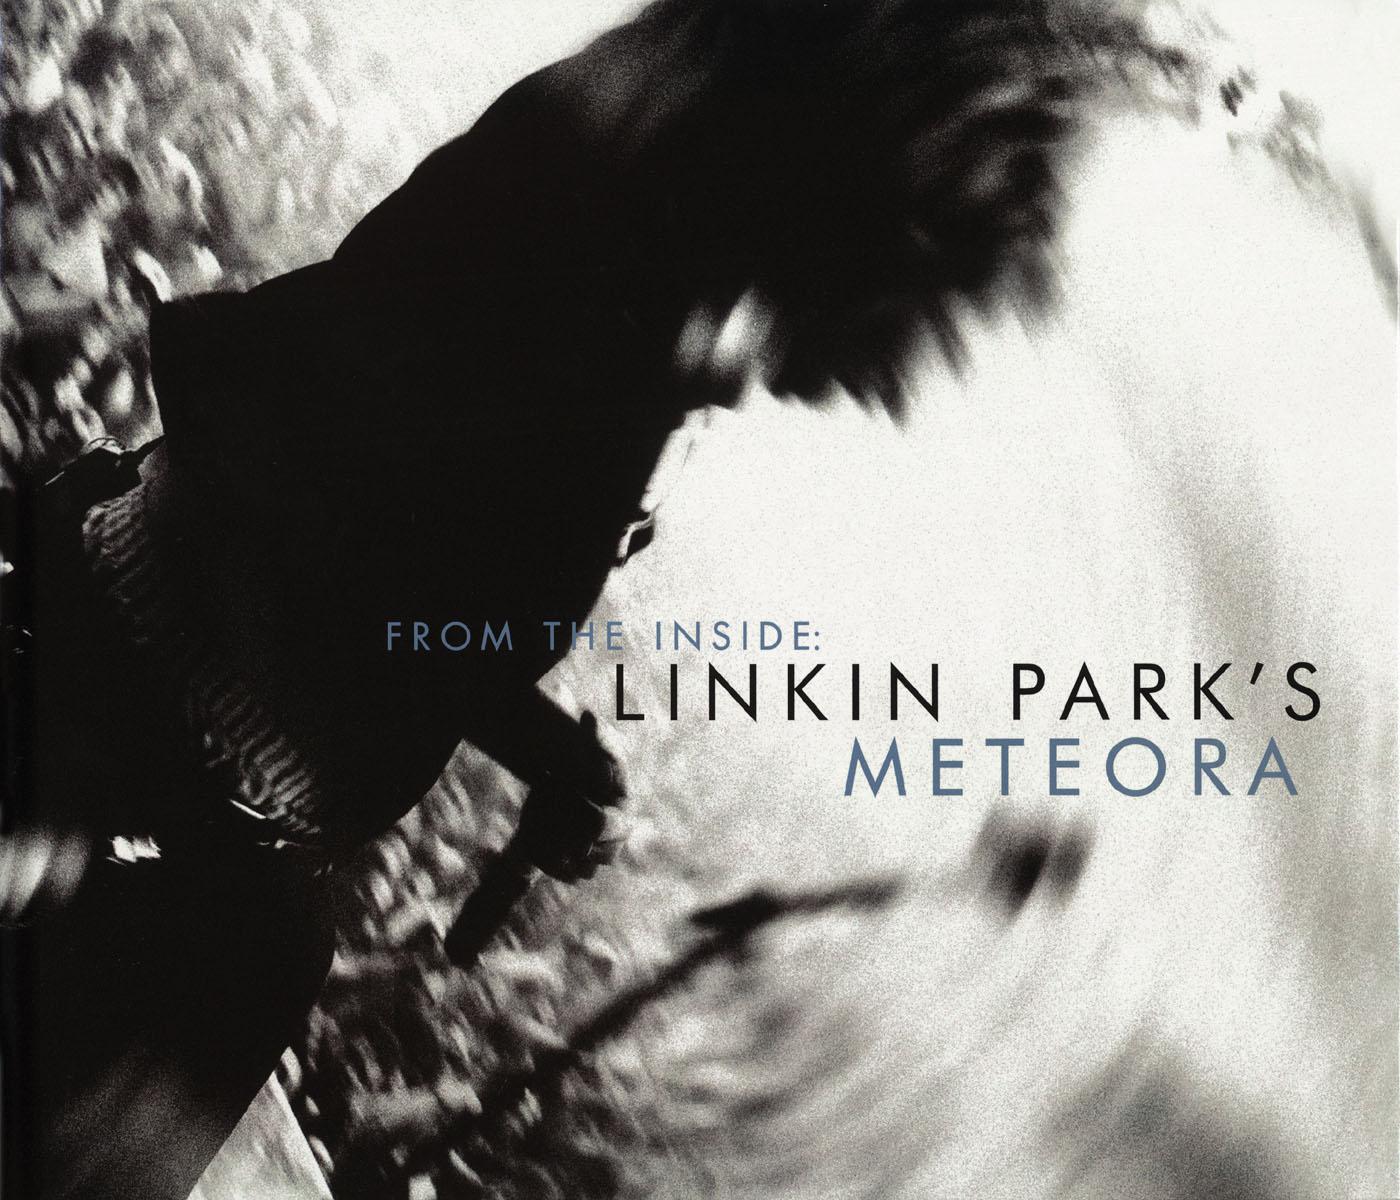 Steve Baltin: From The Inside Linkin Park